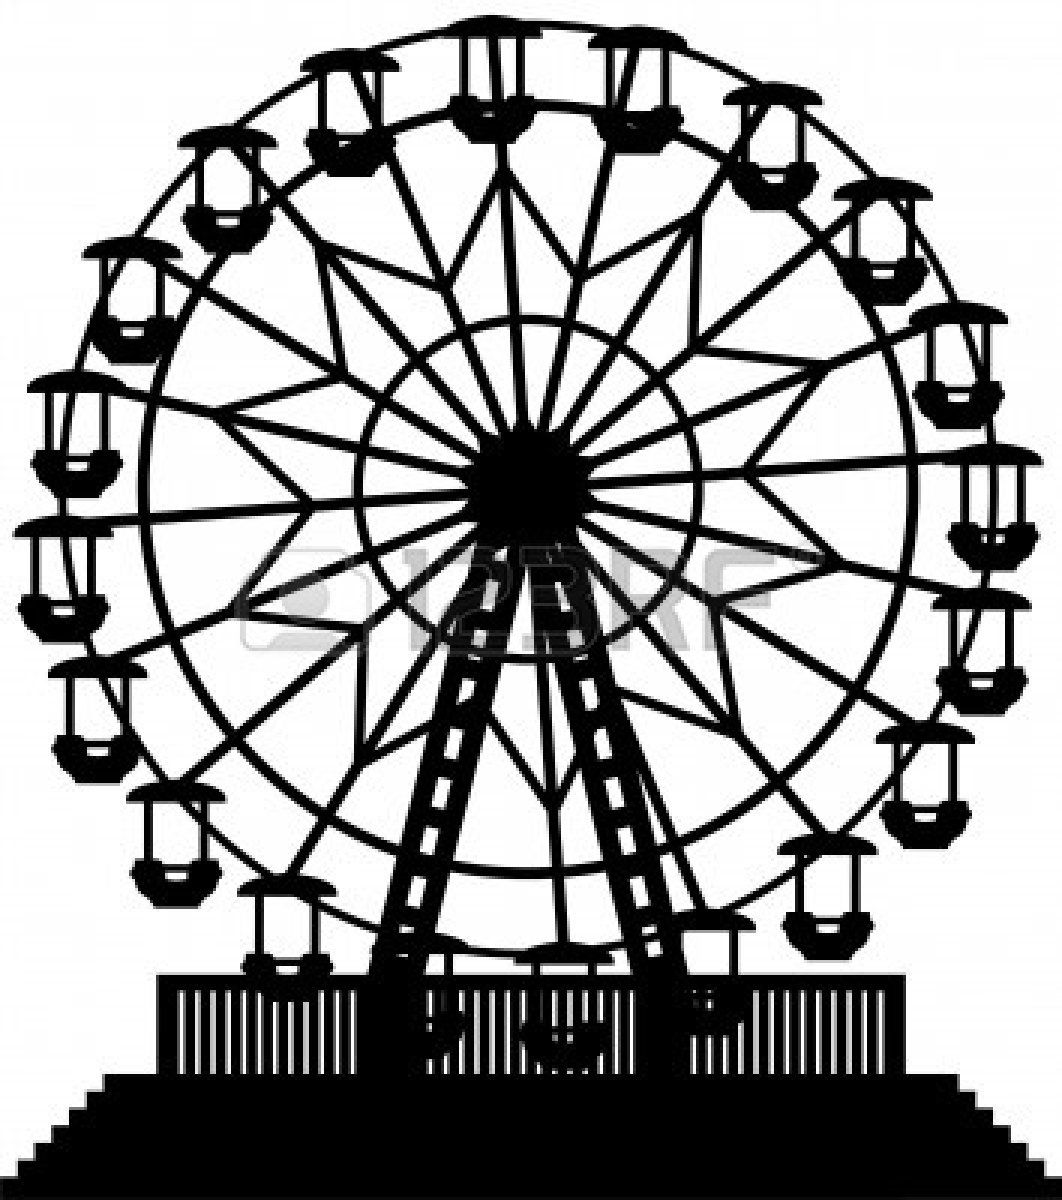 Carnival clipart ferris wheel. Wheels and cut it